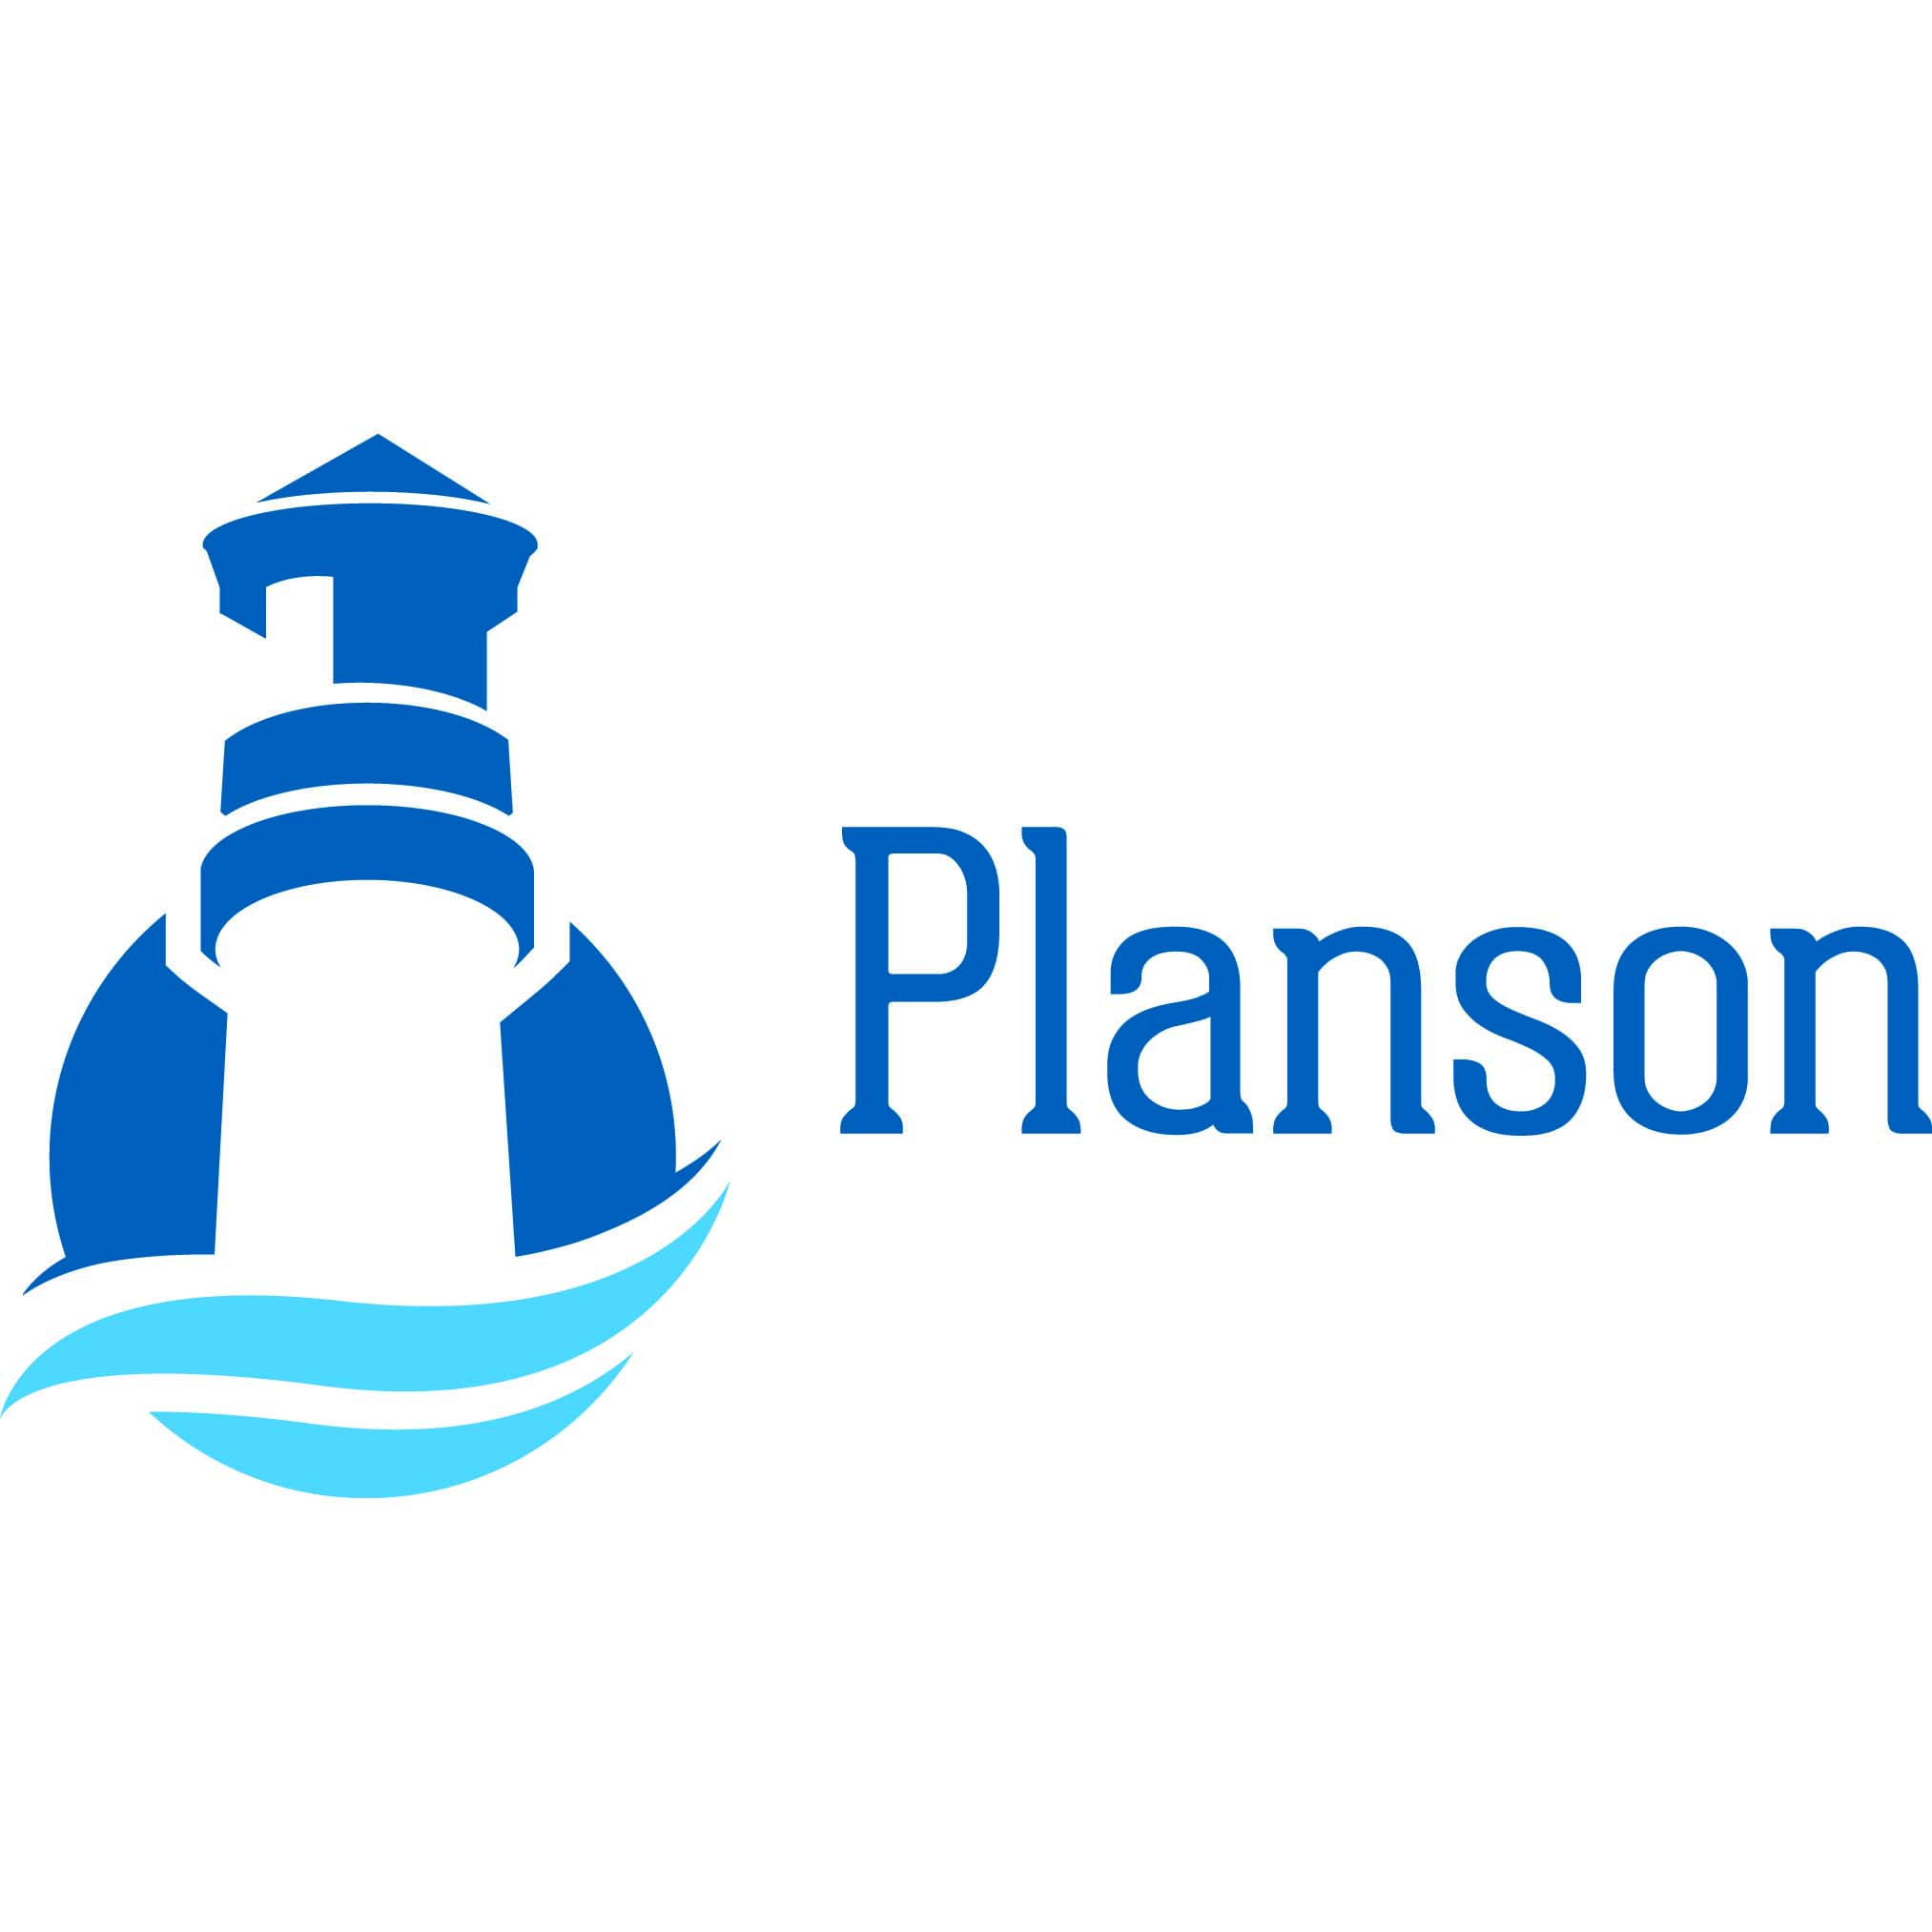 Planson International